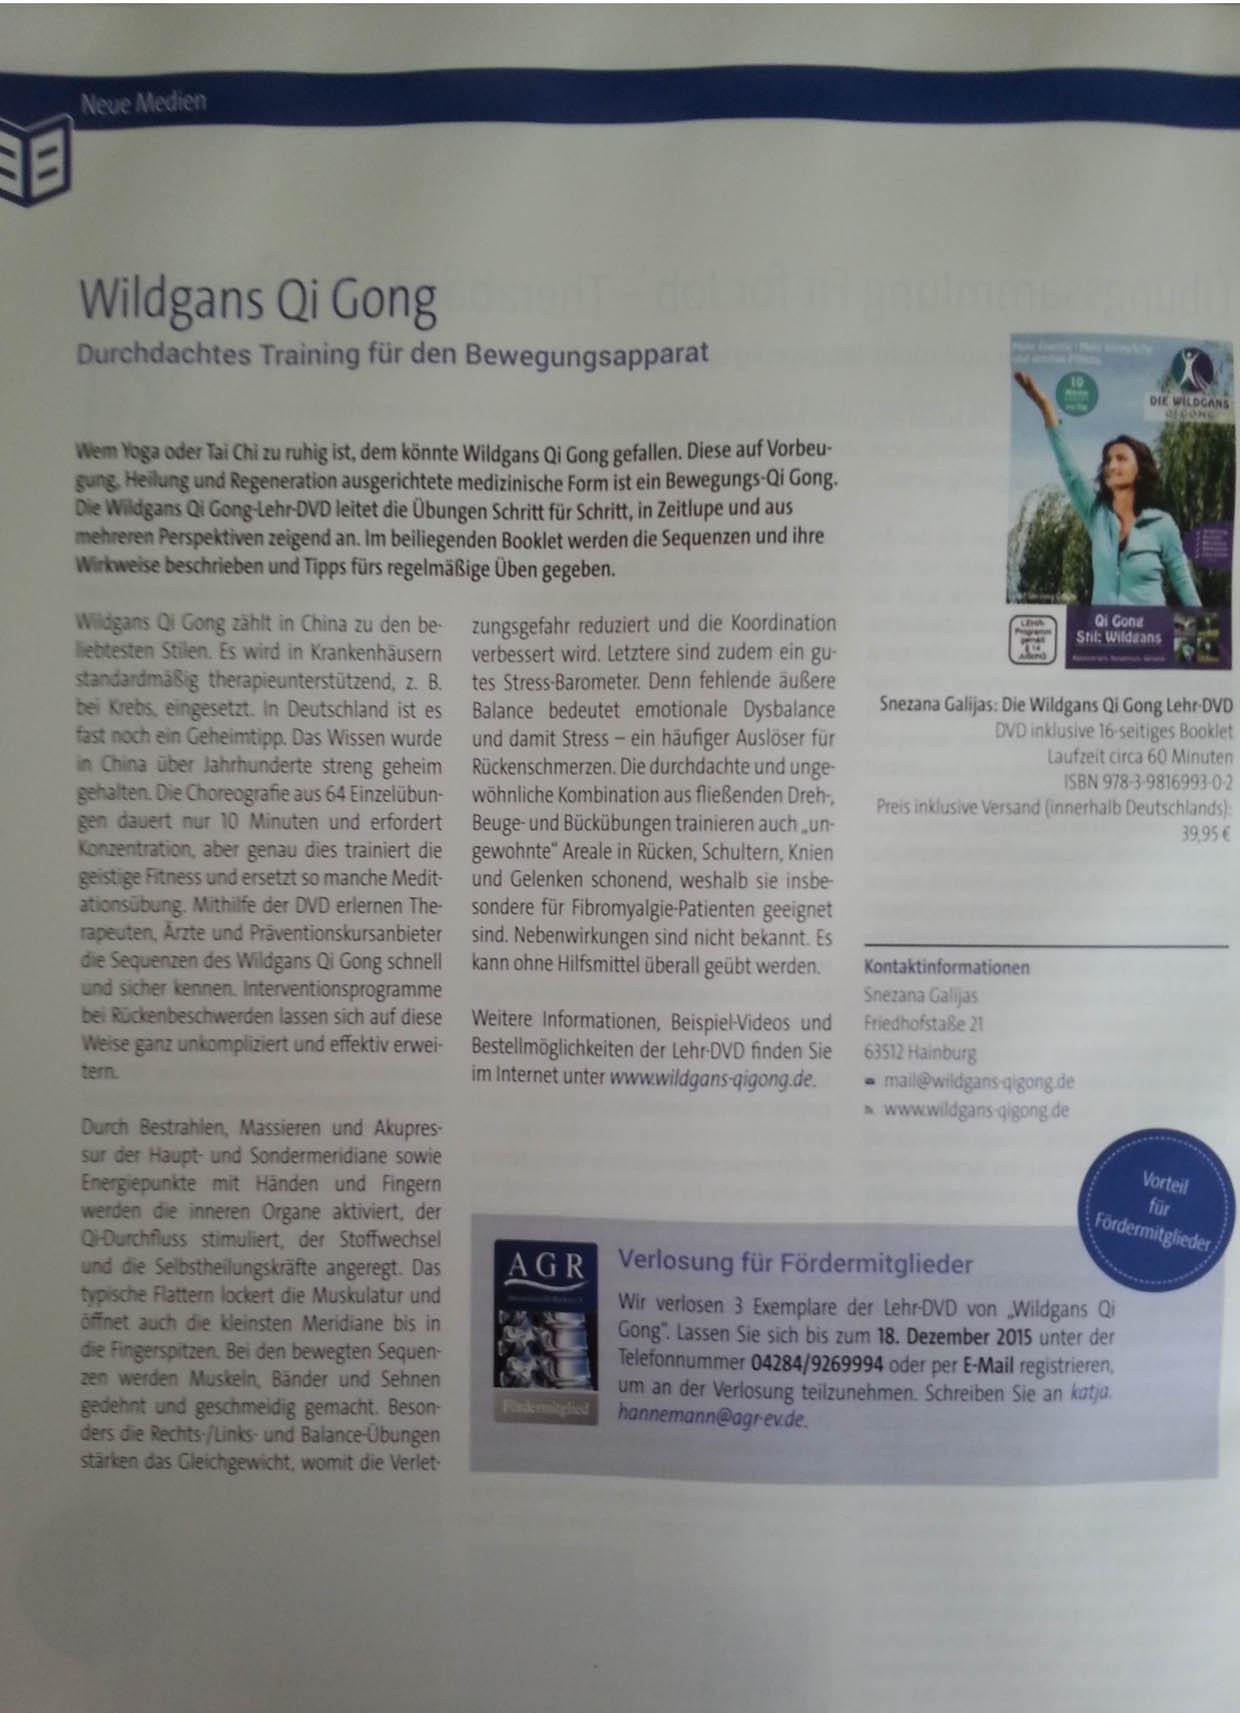 Chi-Kung-Pressetext-AGR-Rückenmagazin-Beitrag-Qigong2015